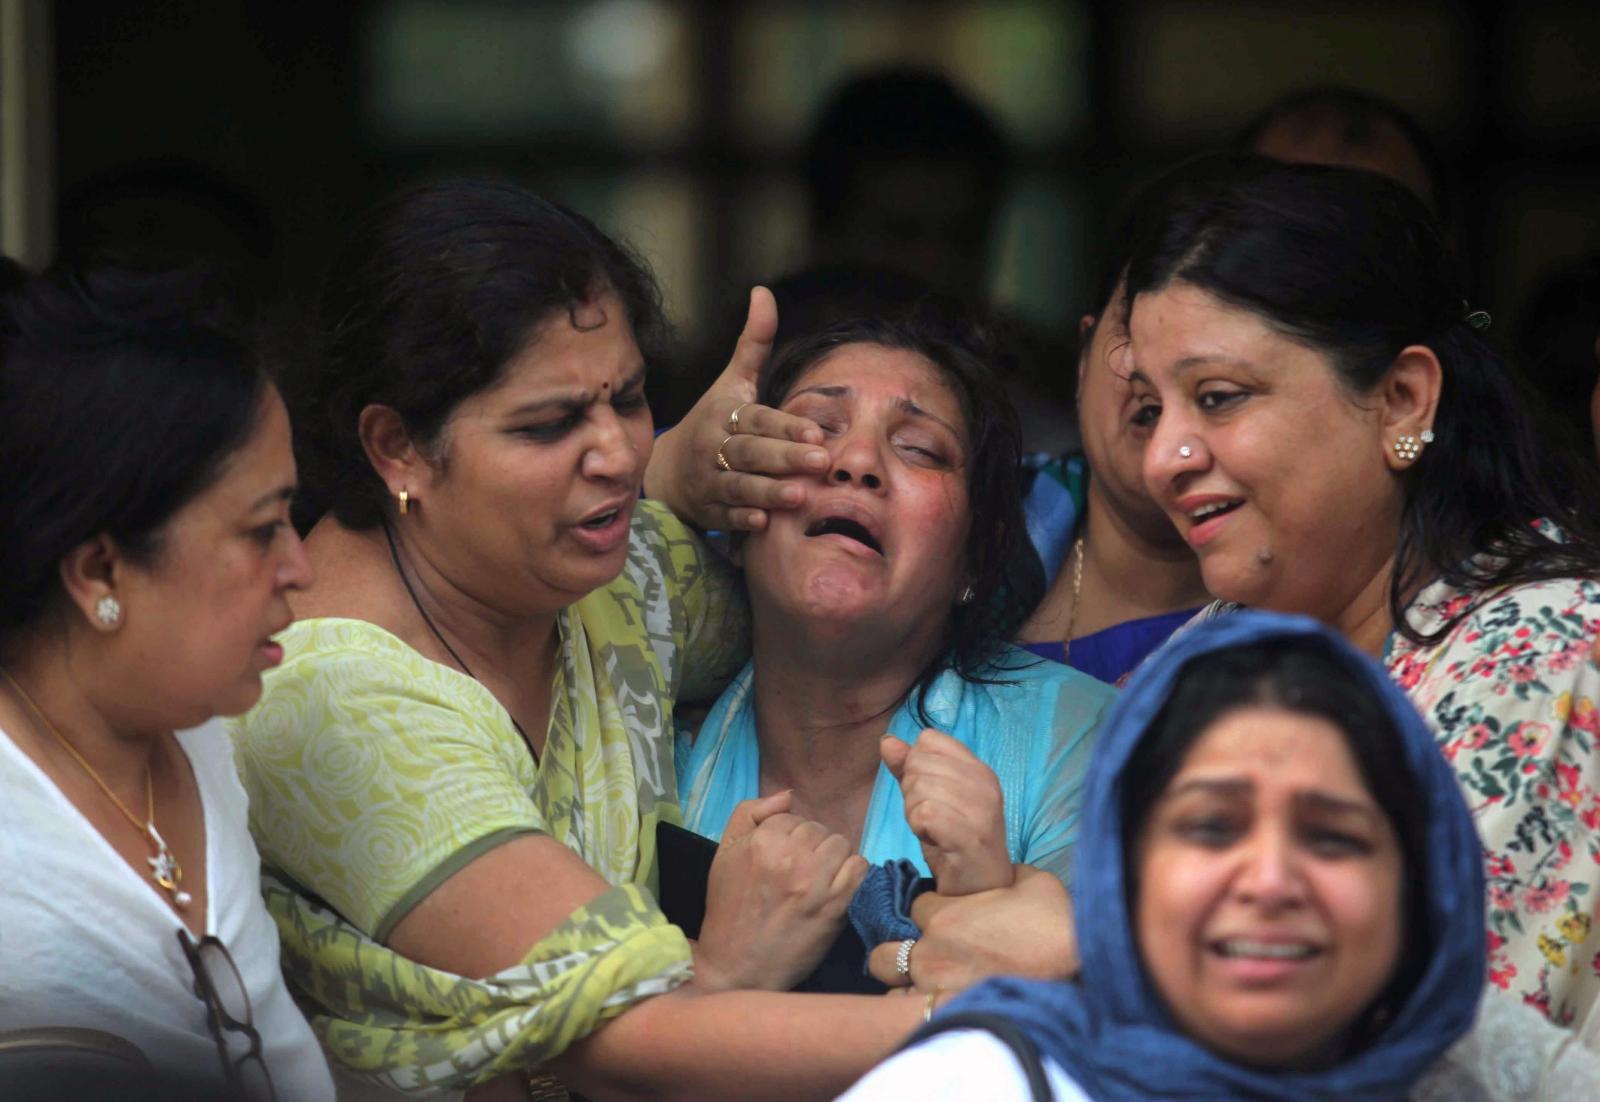 Dhaka cafe attack